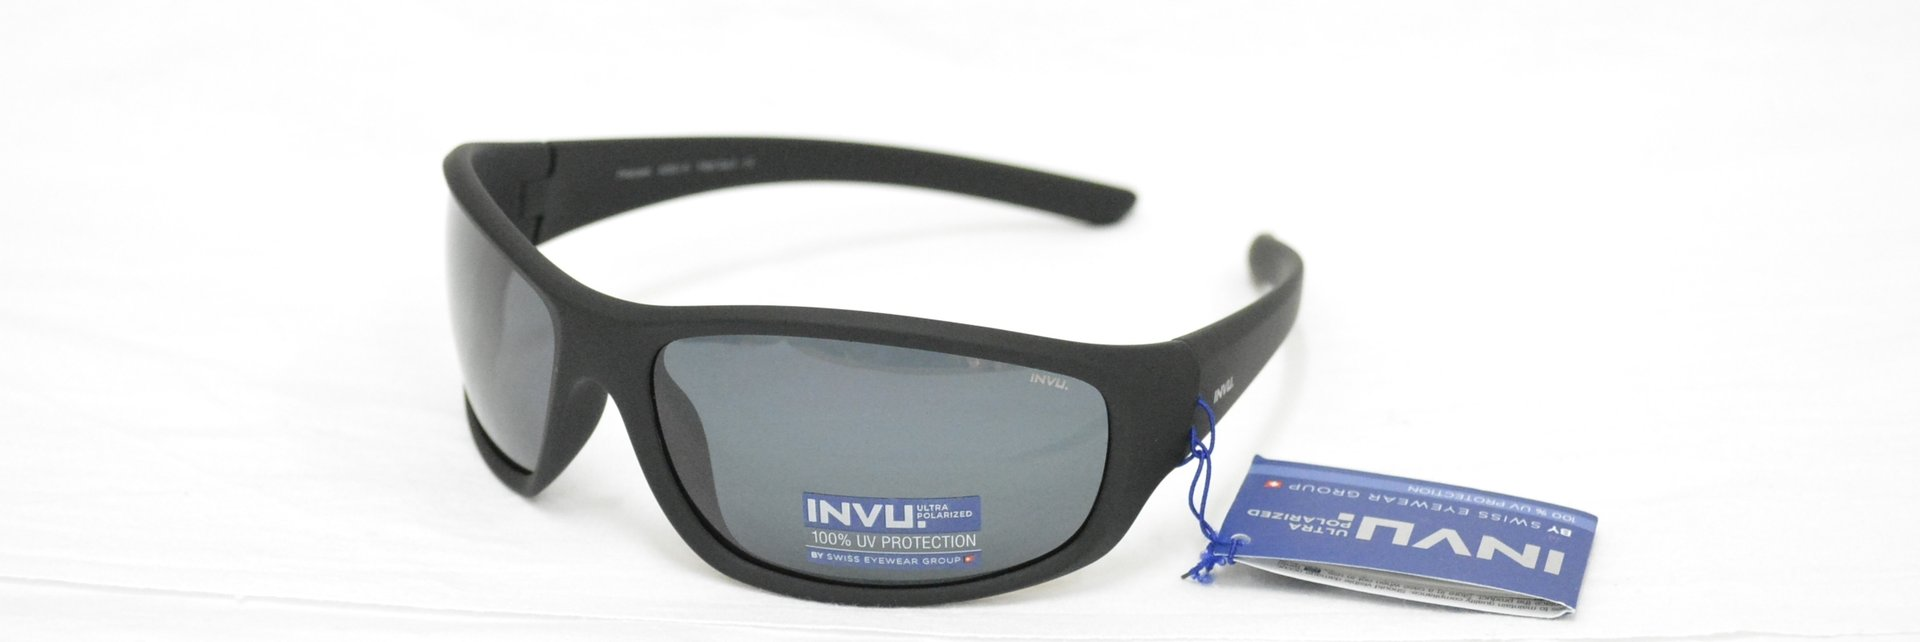 9616295ea0 Sunglasses INVU A 2501 B BLACK RUBBER POLARIZED OTTICA TRAINA